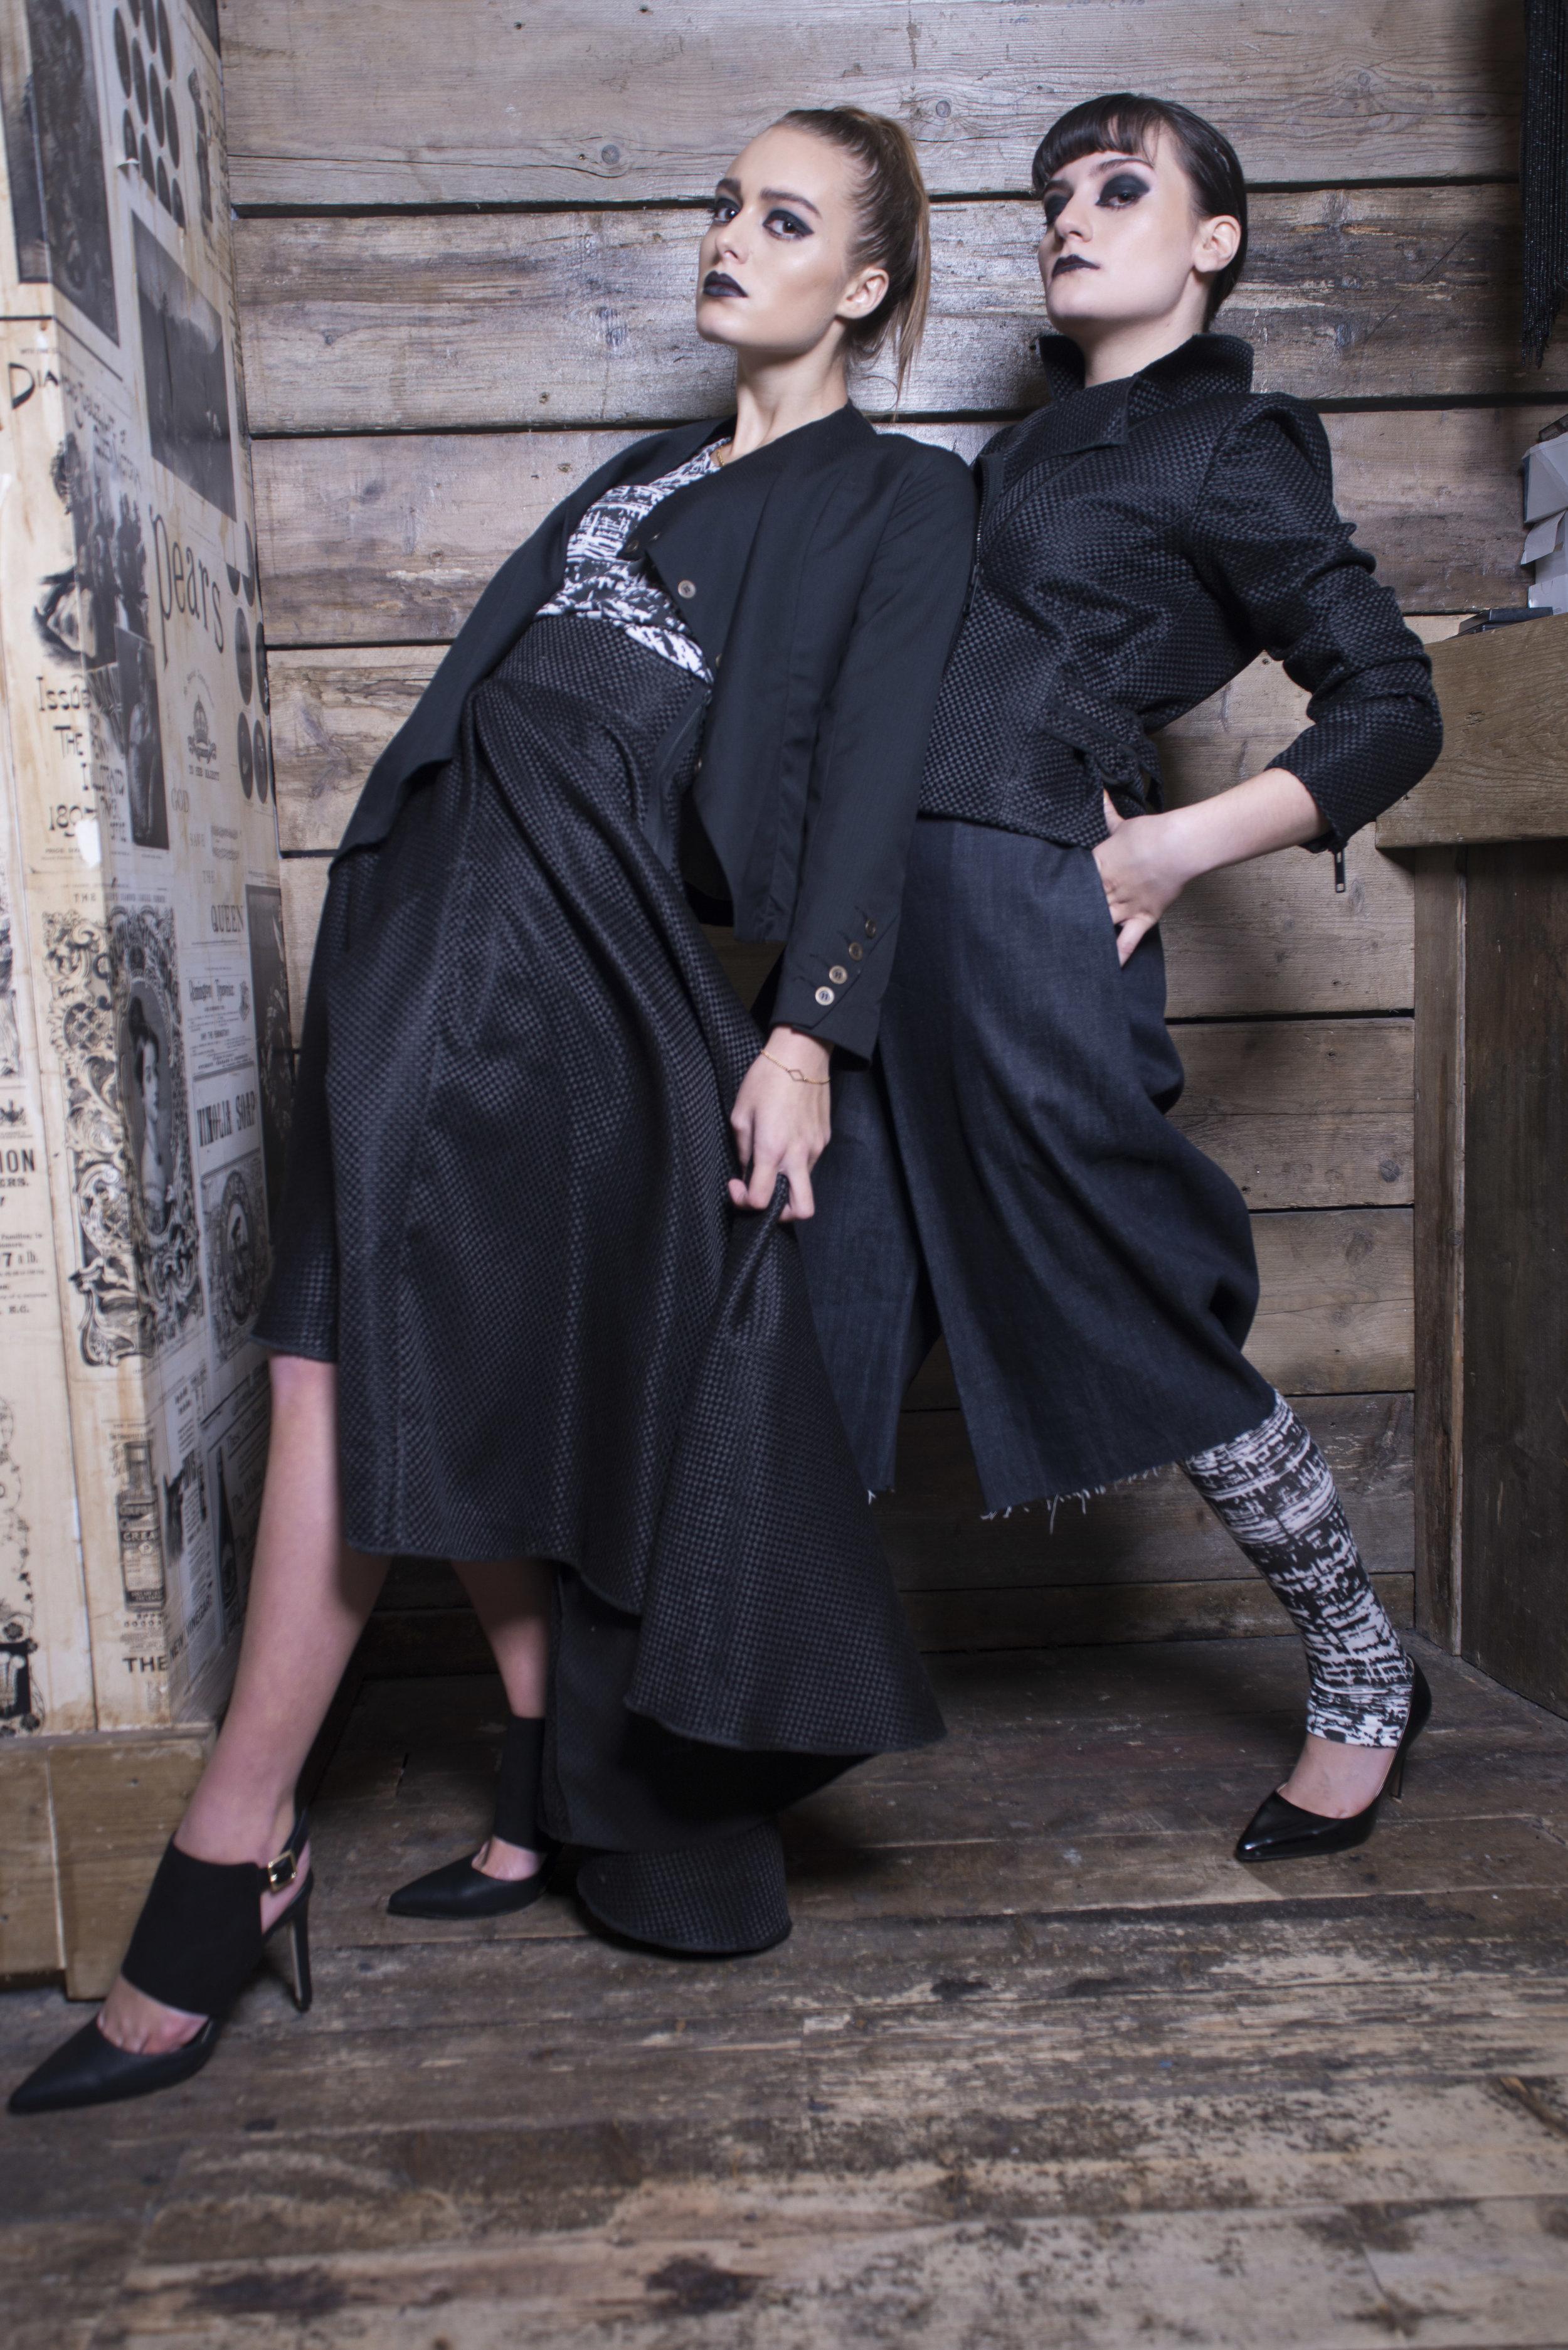 zaramia-ava-zaramiaava-leeds-fashion-designer-ethical-sustainable-tailored-minimalist-jacket-mio-mai-coat-jacket-print-shirt-trousers-top-versatile-drape-cowl-styling-shop-womenswear-4